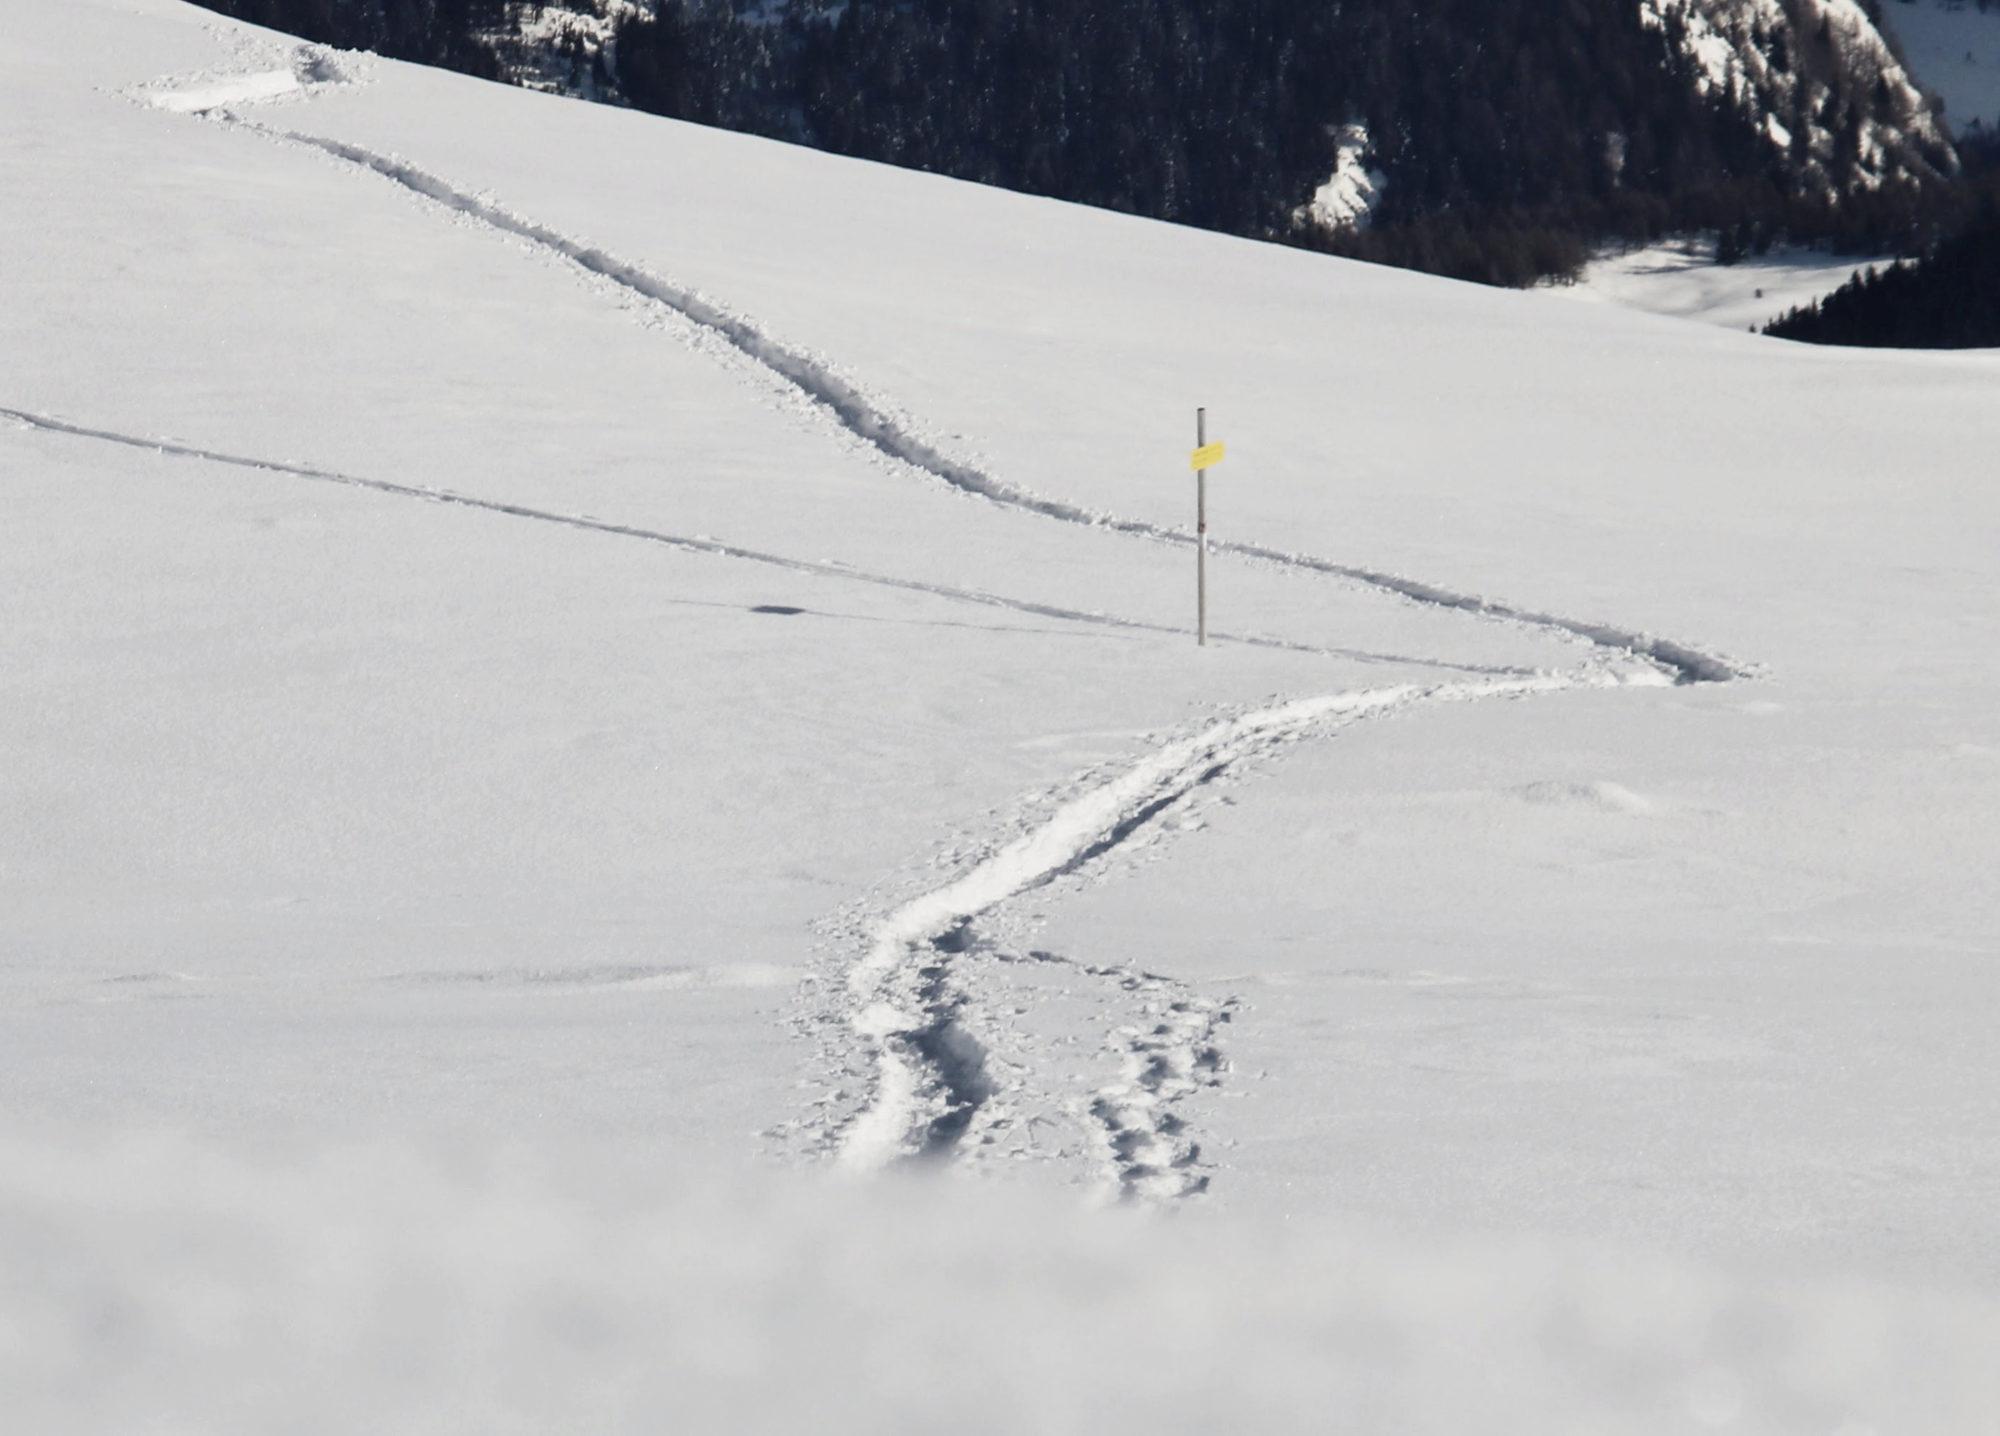 Tiefschneespuren beim Schneeschuhwandern